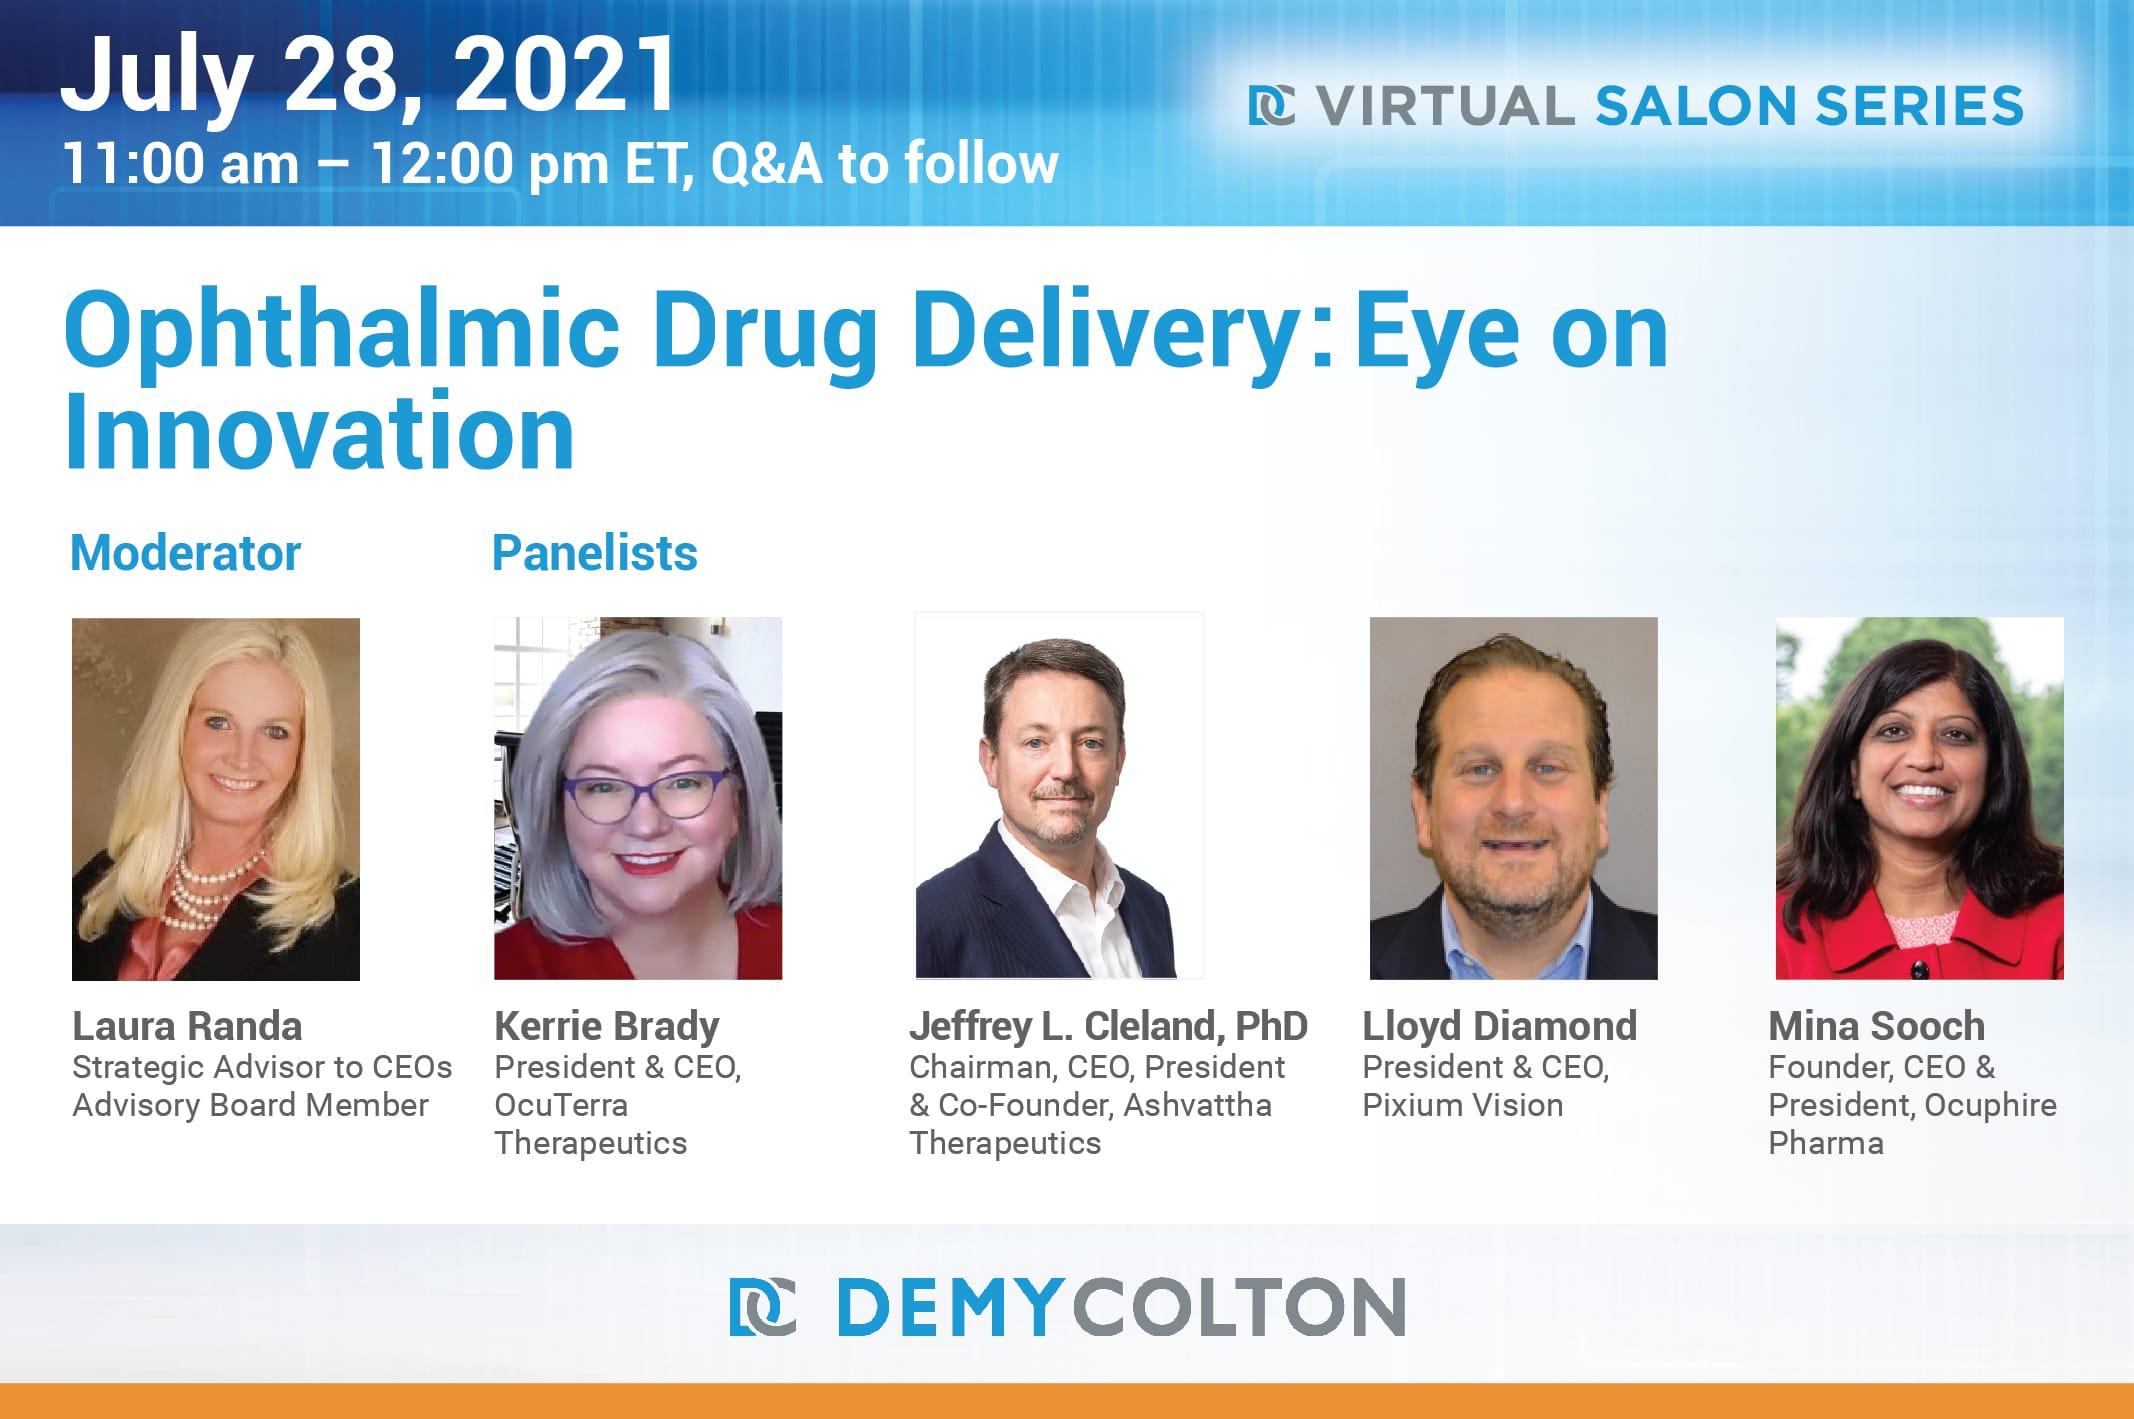 Ophthalmic Drug Delivery: Eye on Innovation July 28, 2021